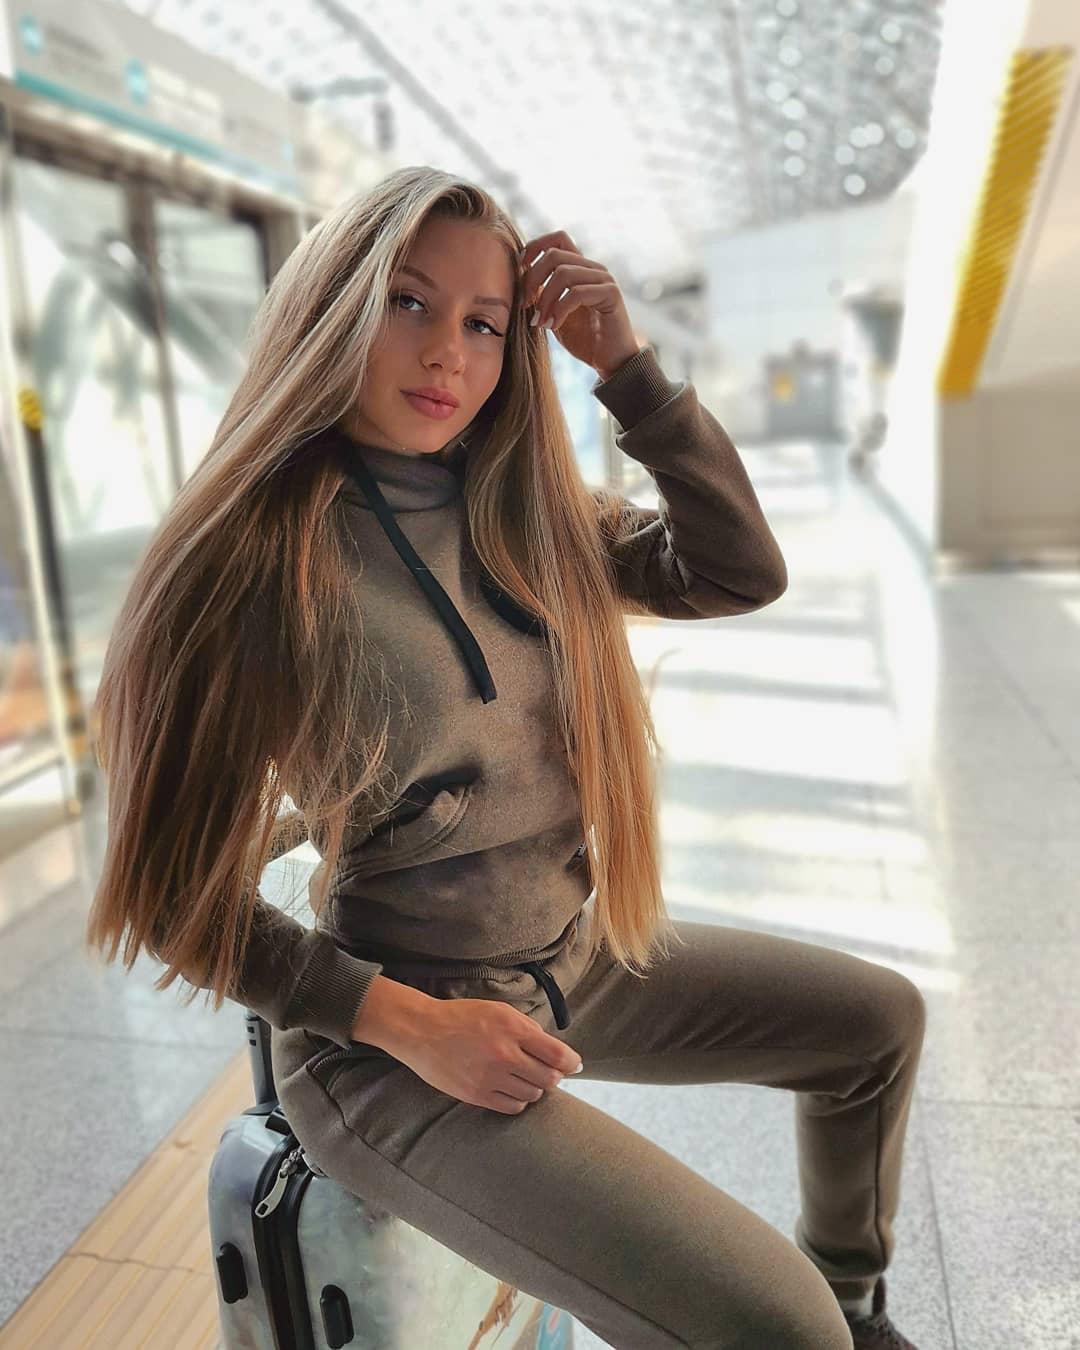 Alina-Cherepanova-Wallpapers-Insta-Fit-Bio-3